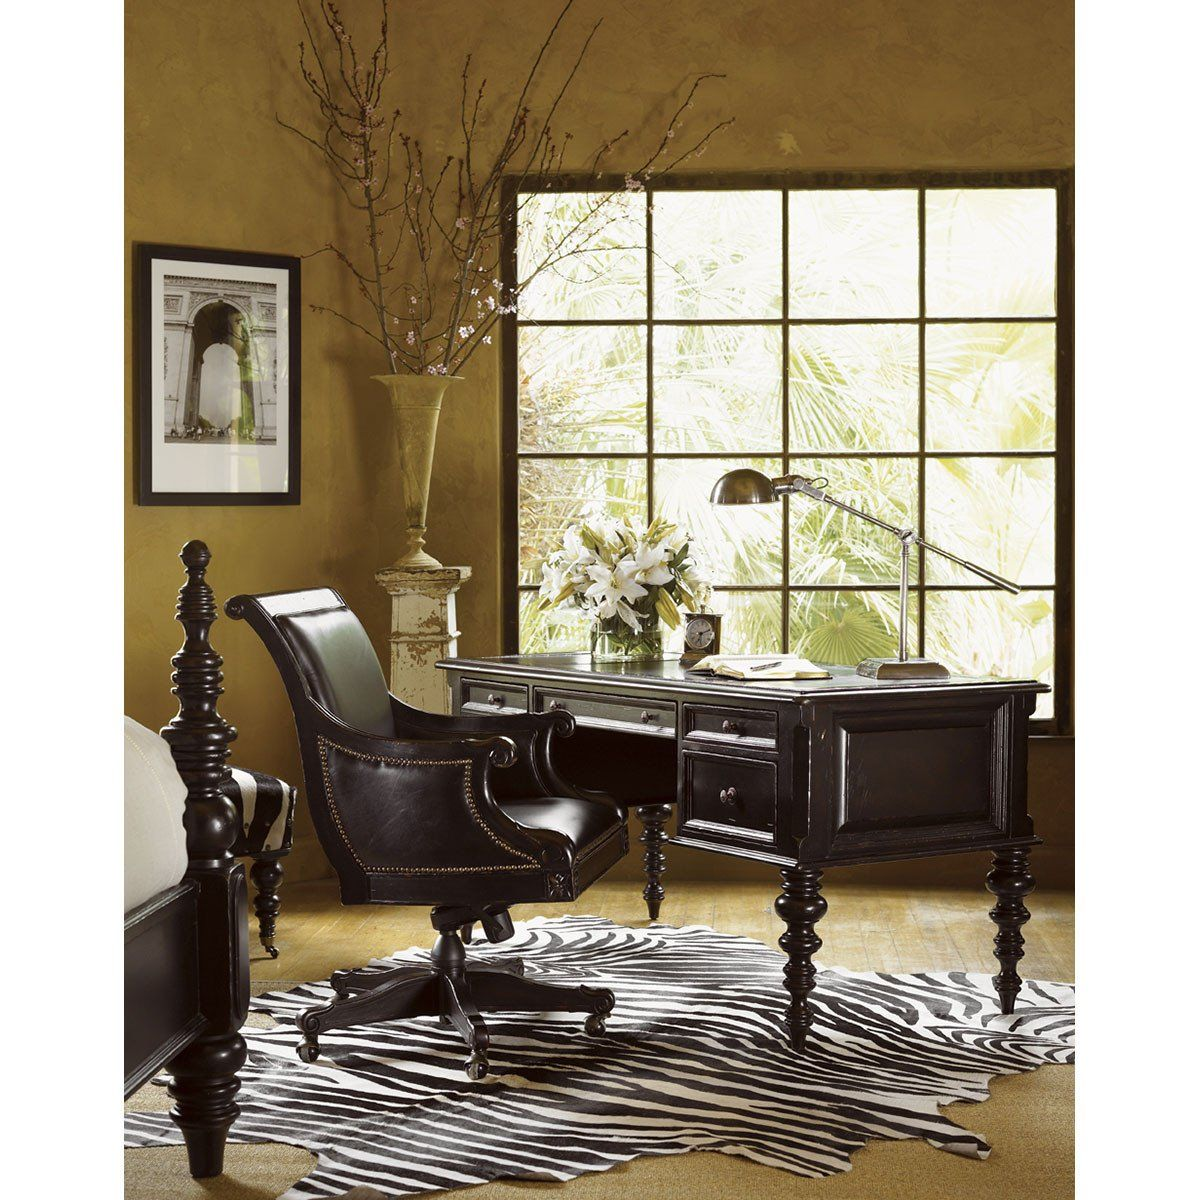 Paul schatz furniture portland or  Tommy Bahama Kingstown Admiralty Desk Chair   Interior